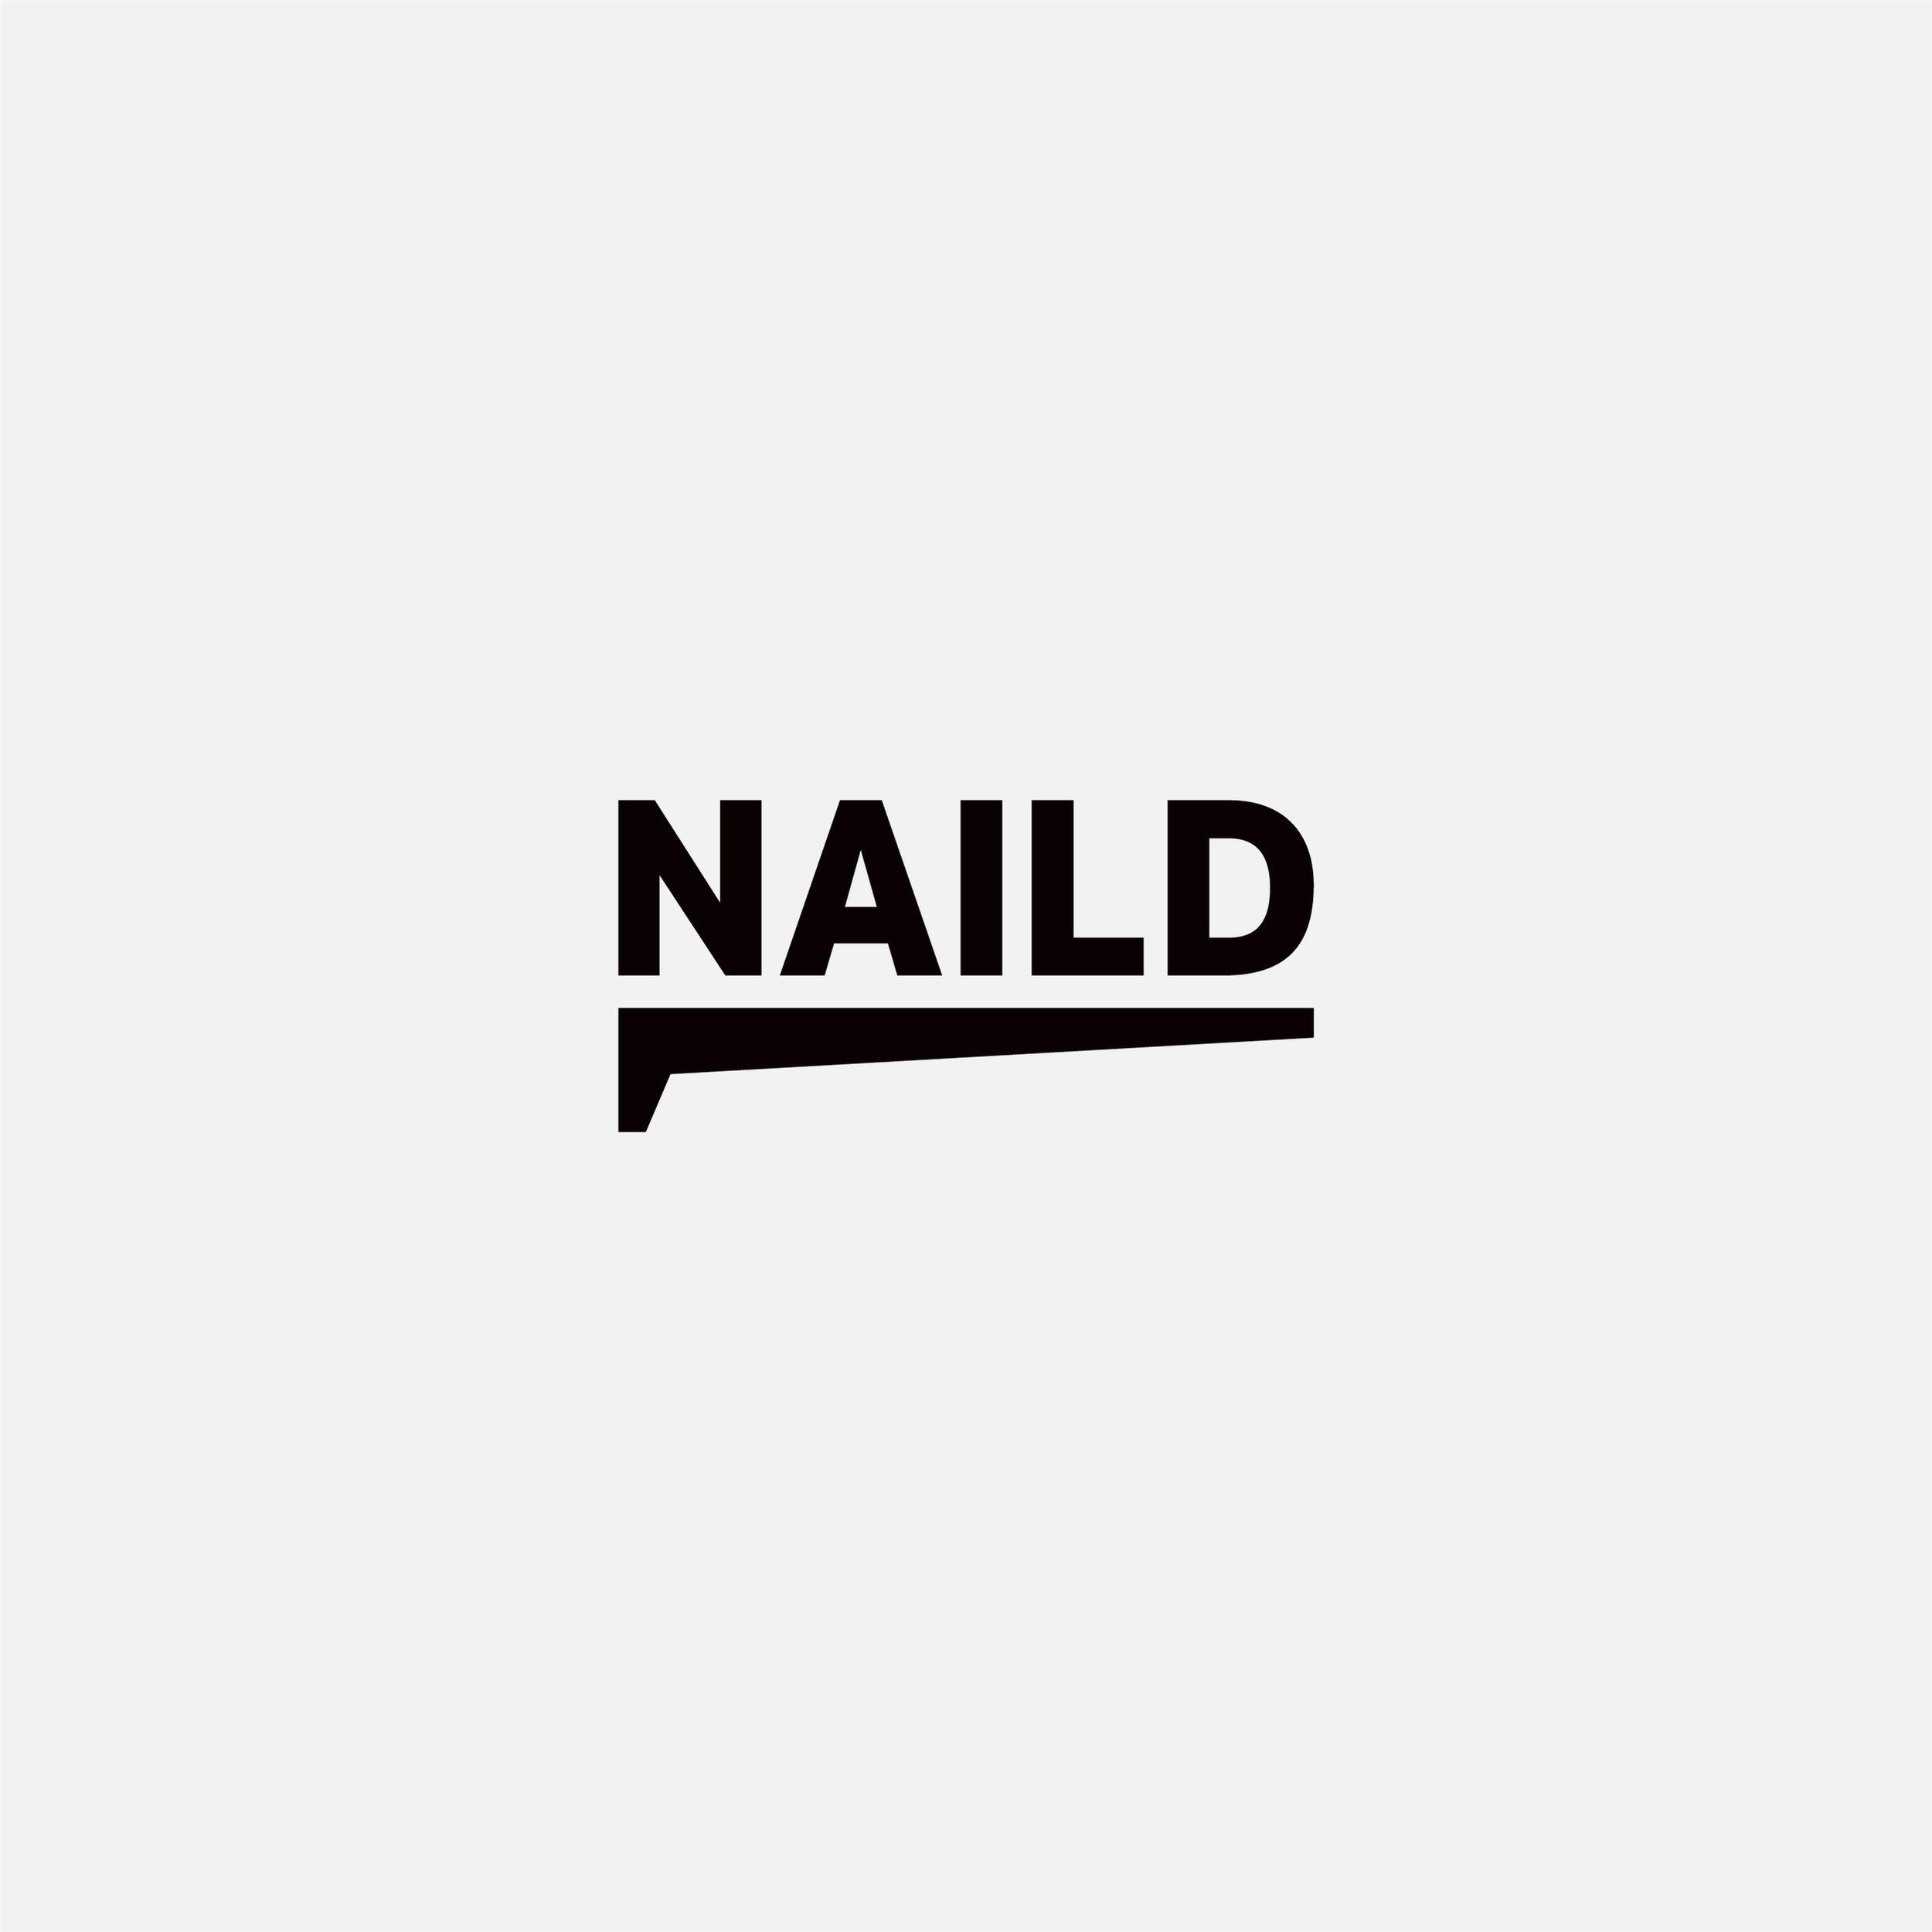 Naild.jpg